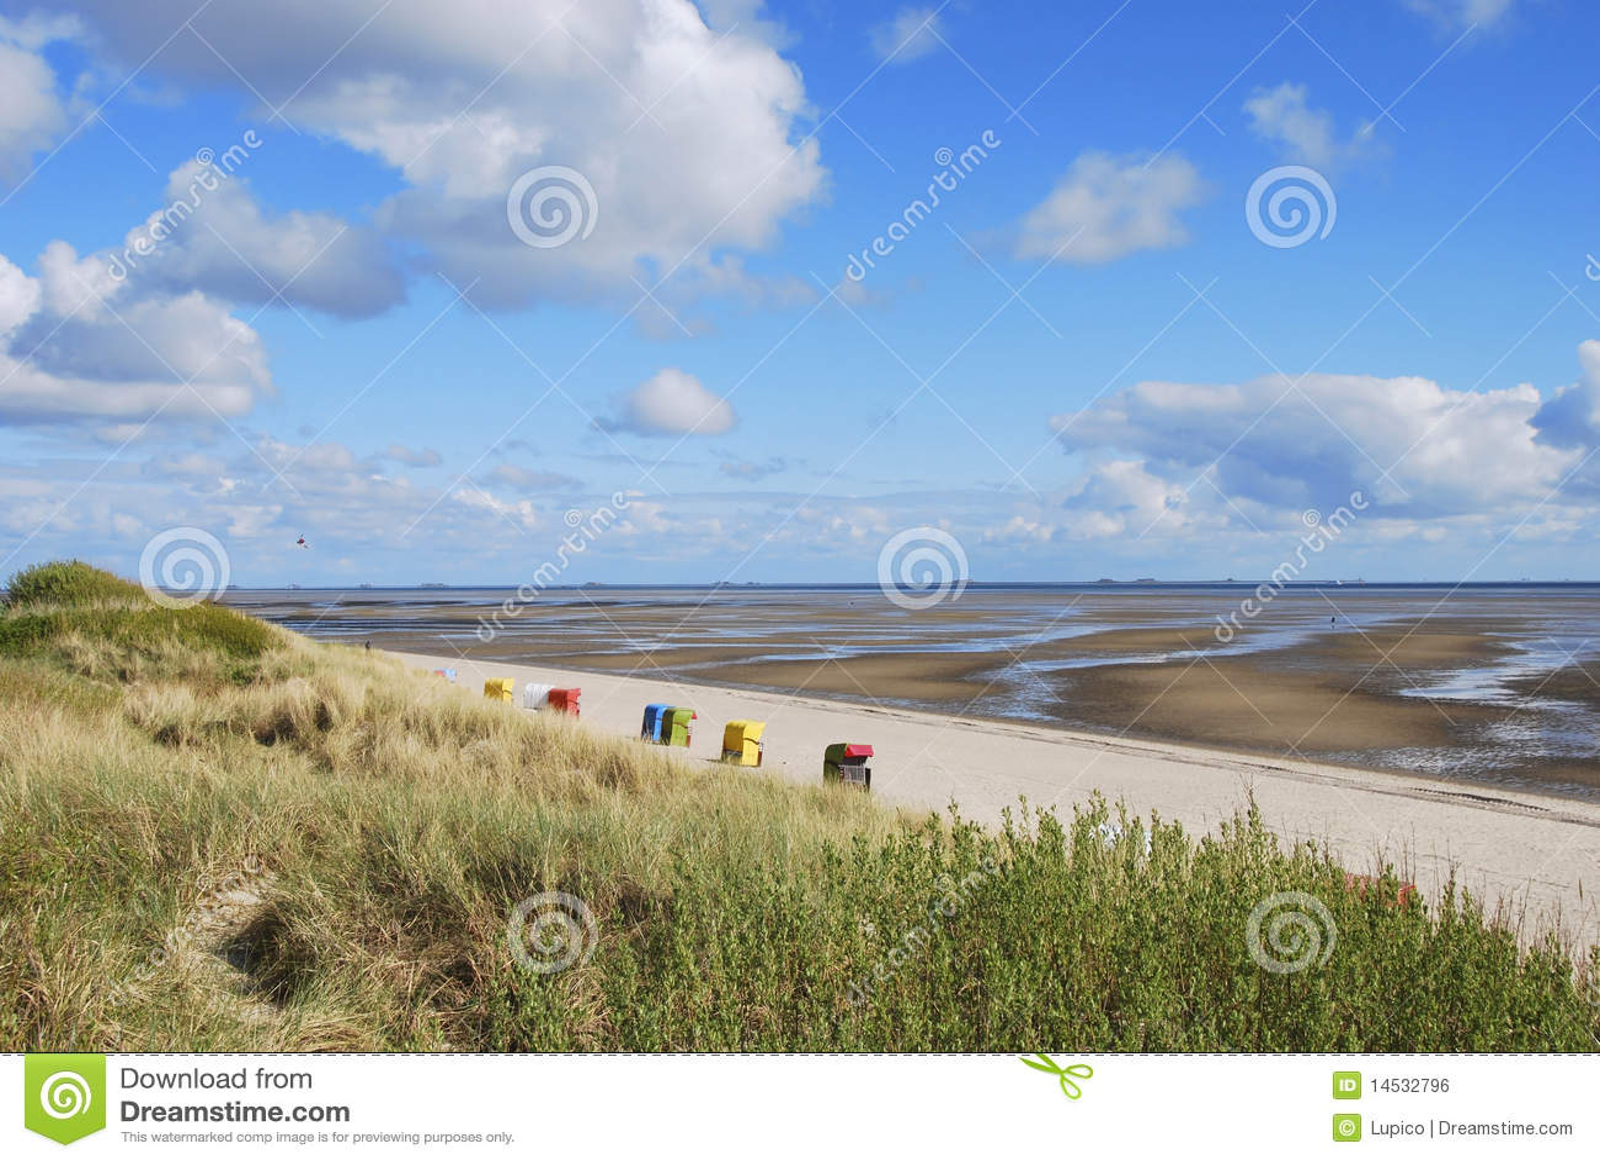 Mud Flats and Beach